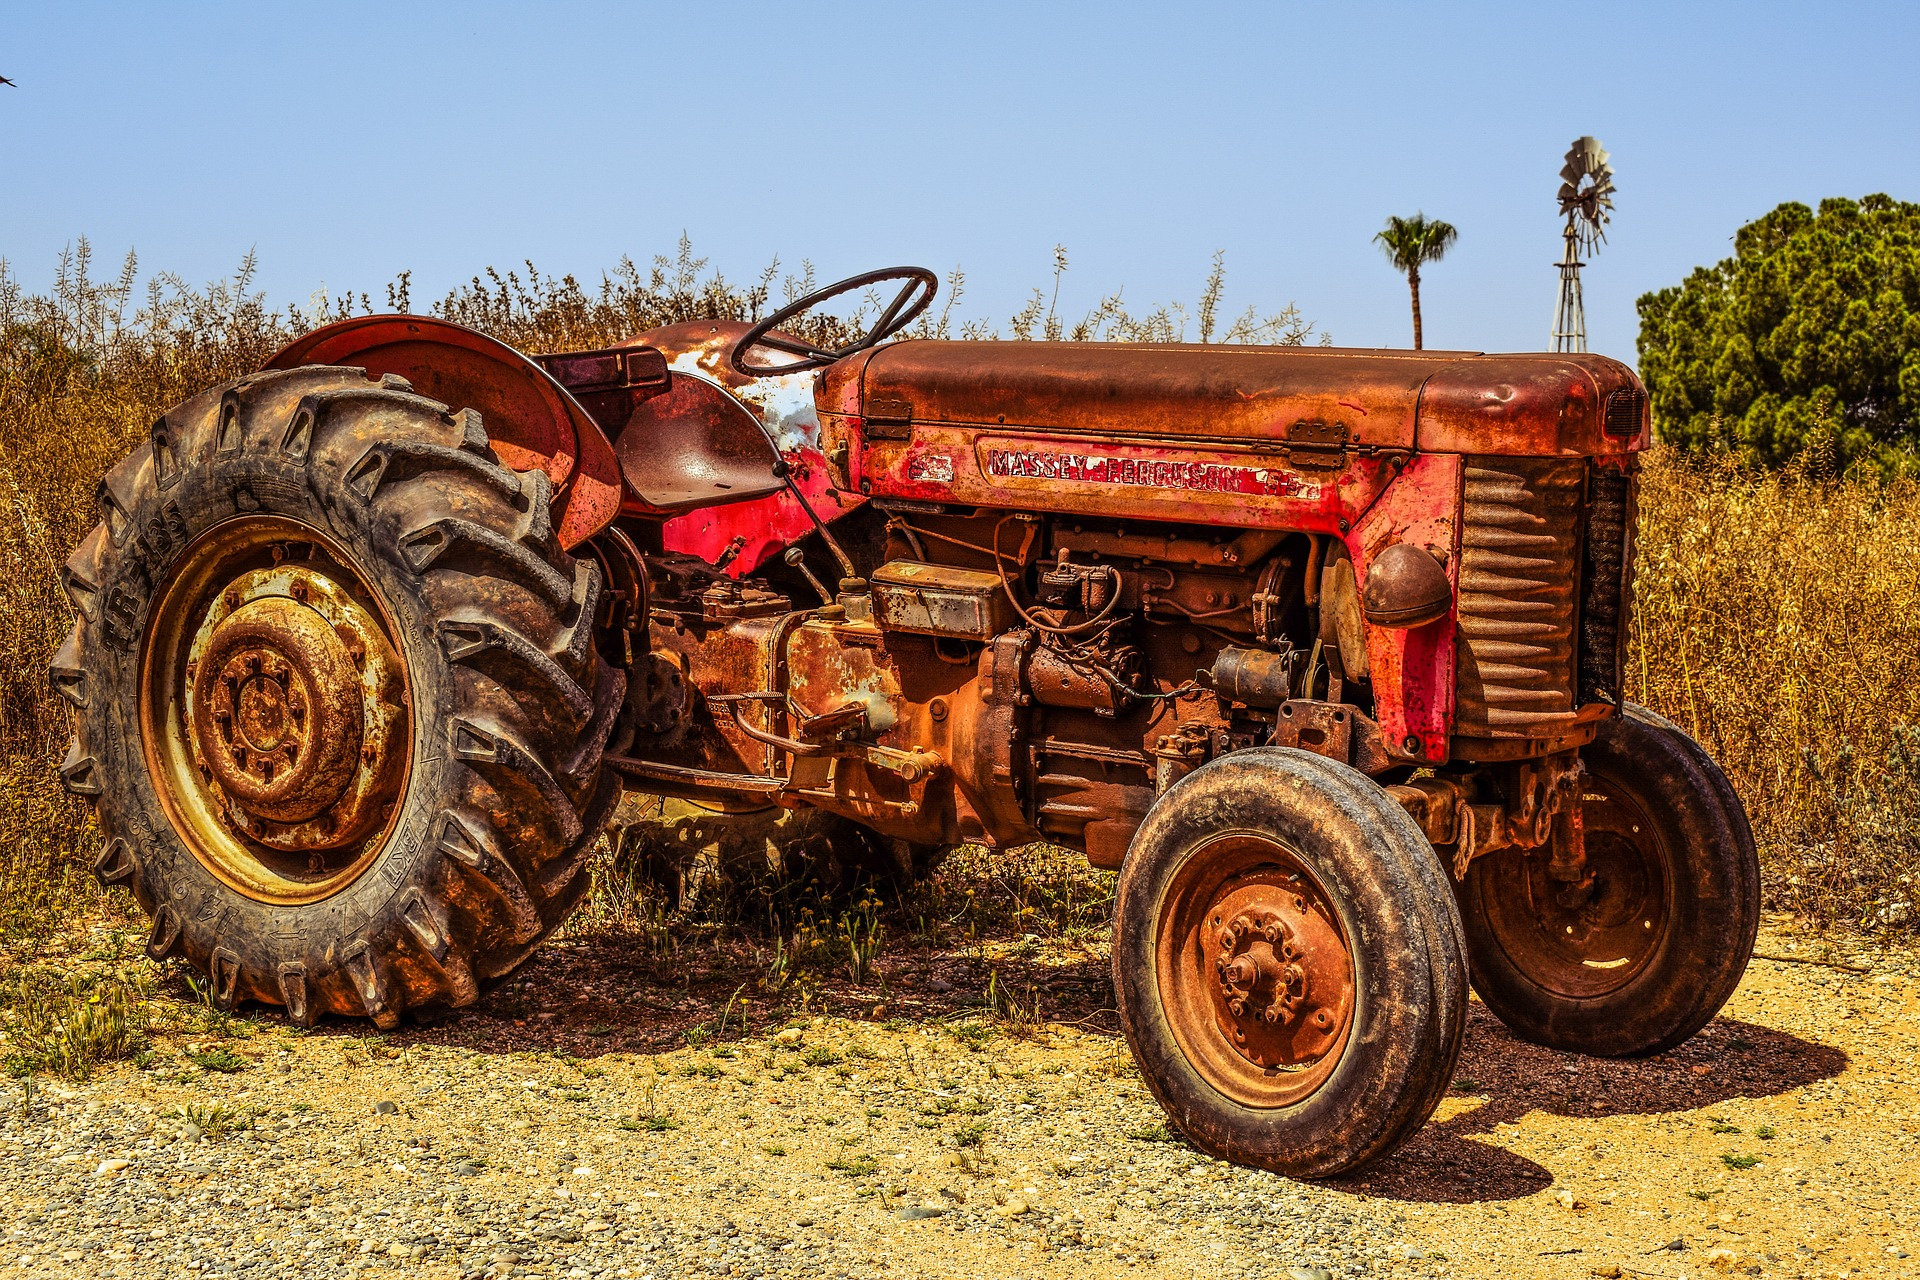 tractor-2271577_1920.jpg